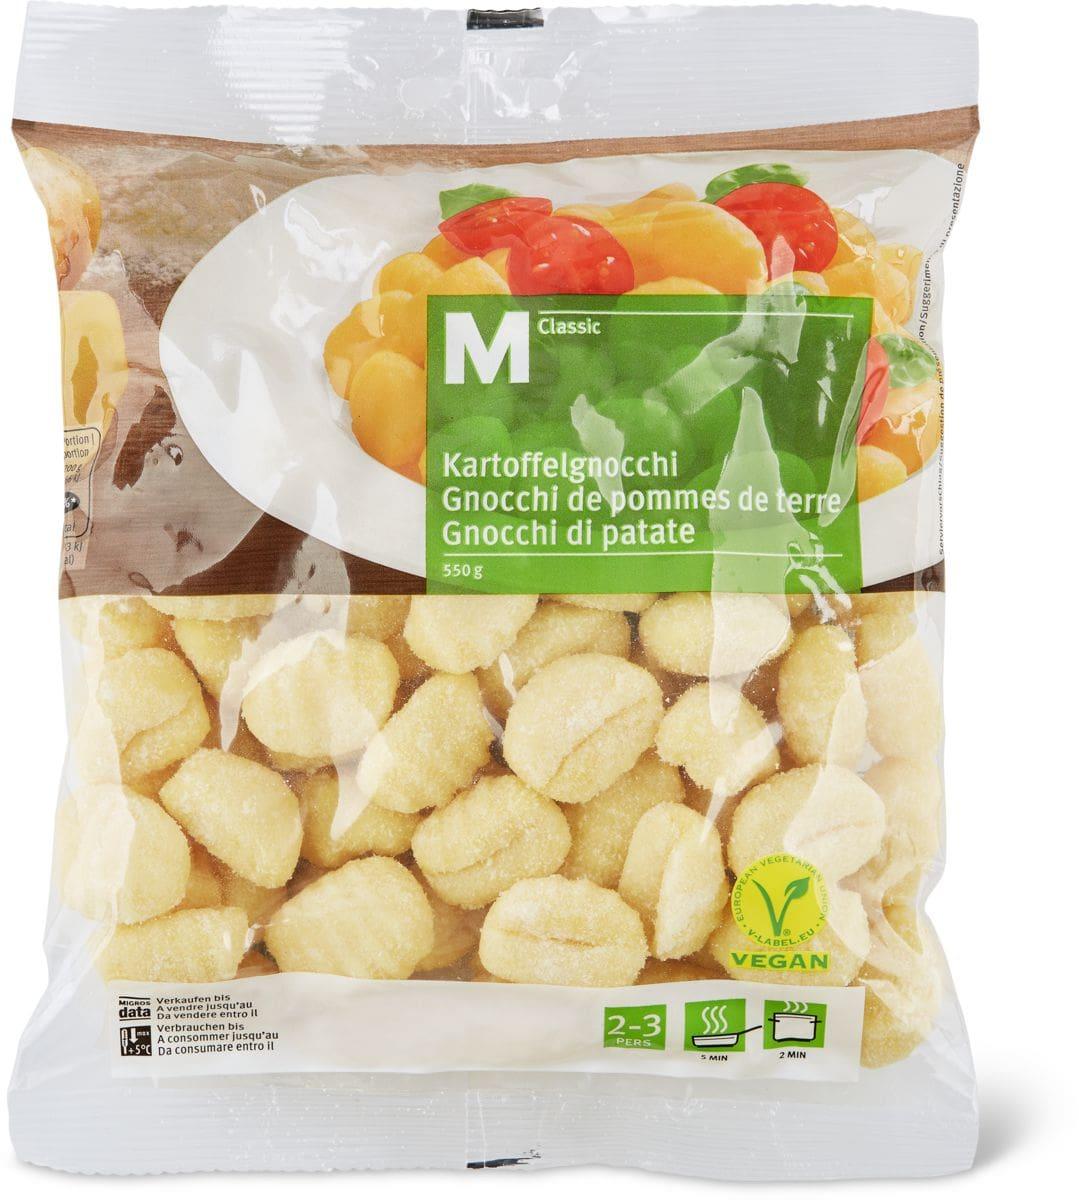 M-Classic Gnocchi mit Kartoffeln